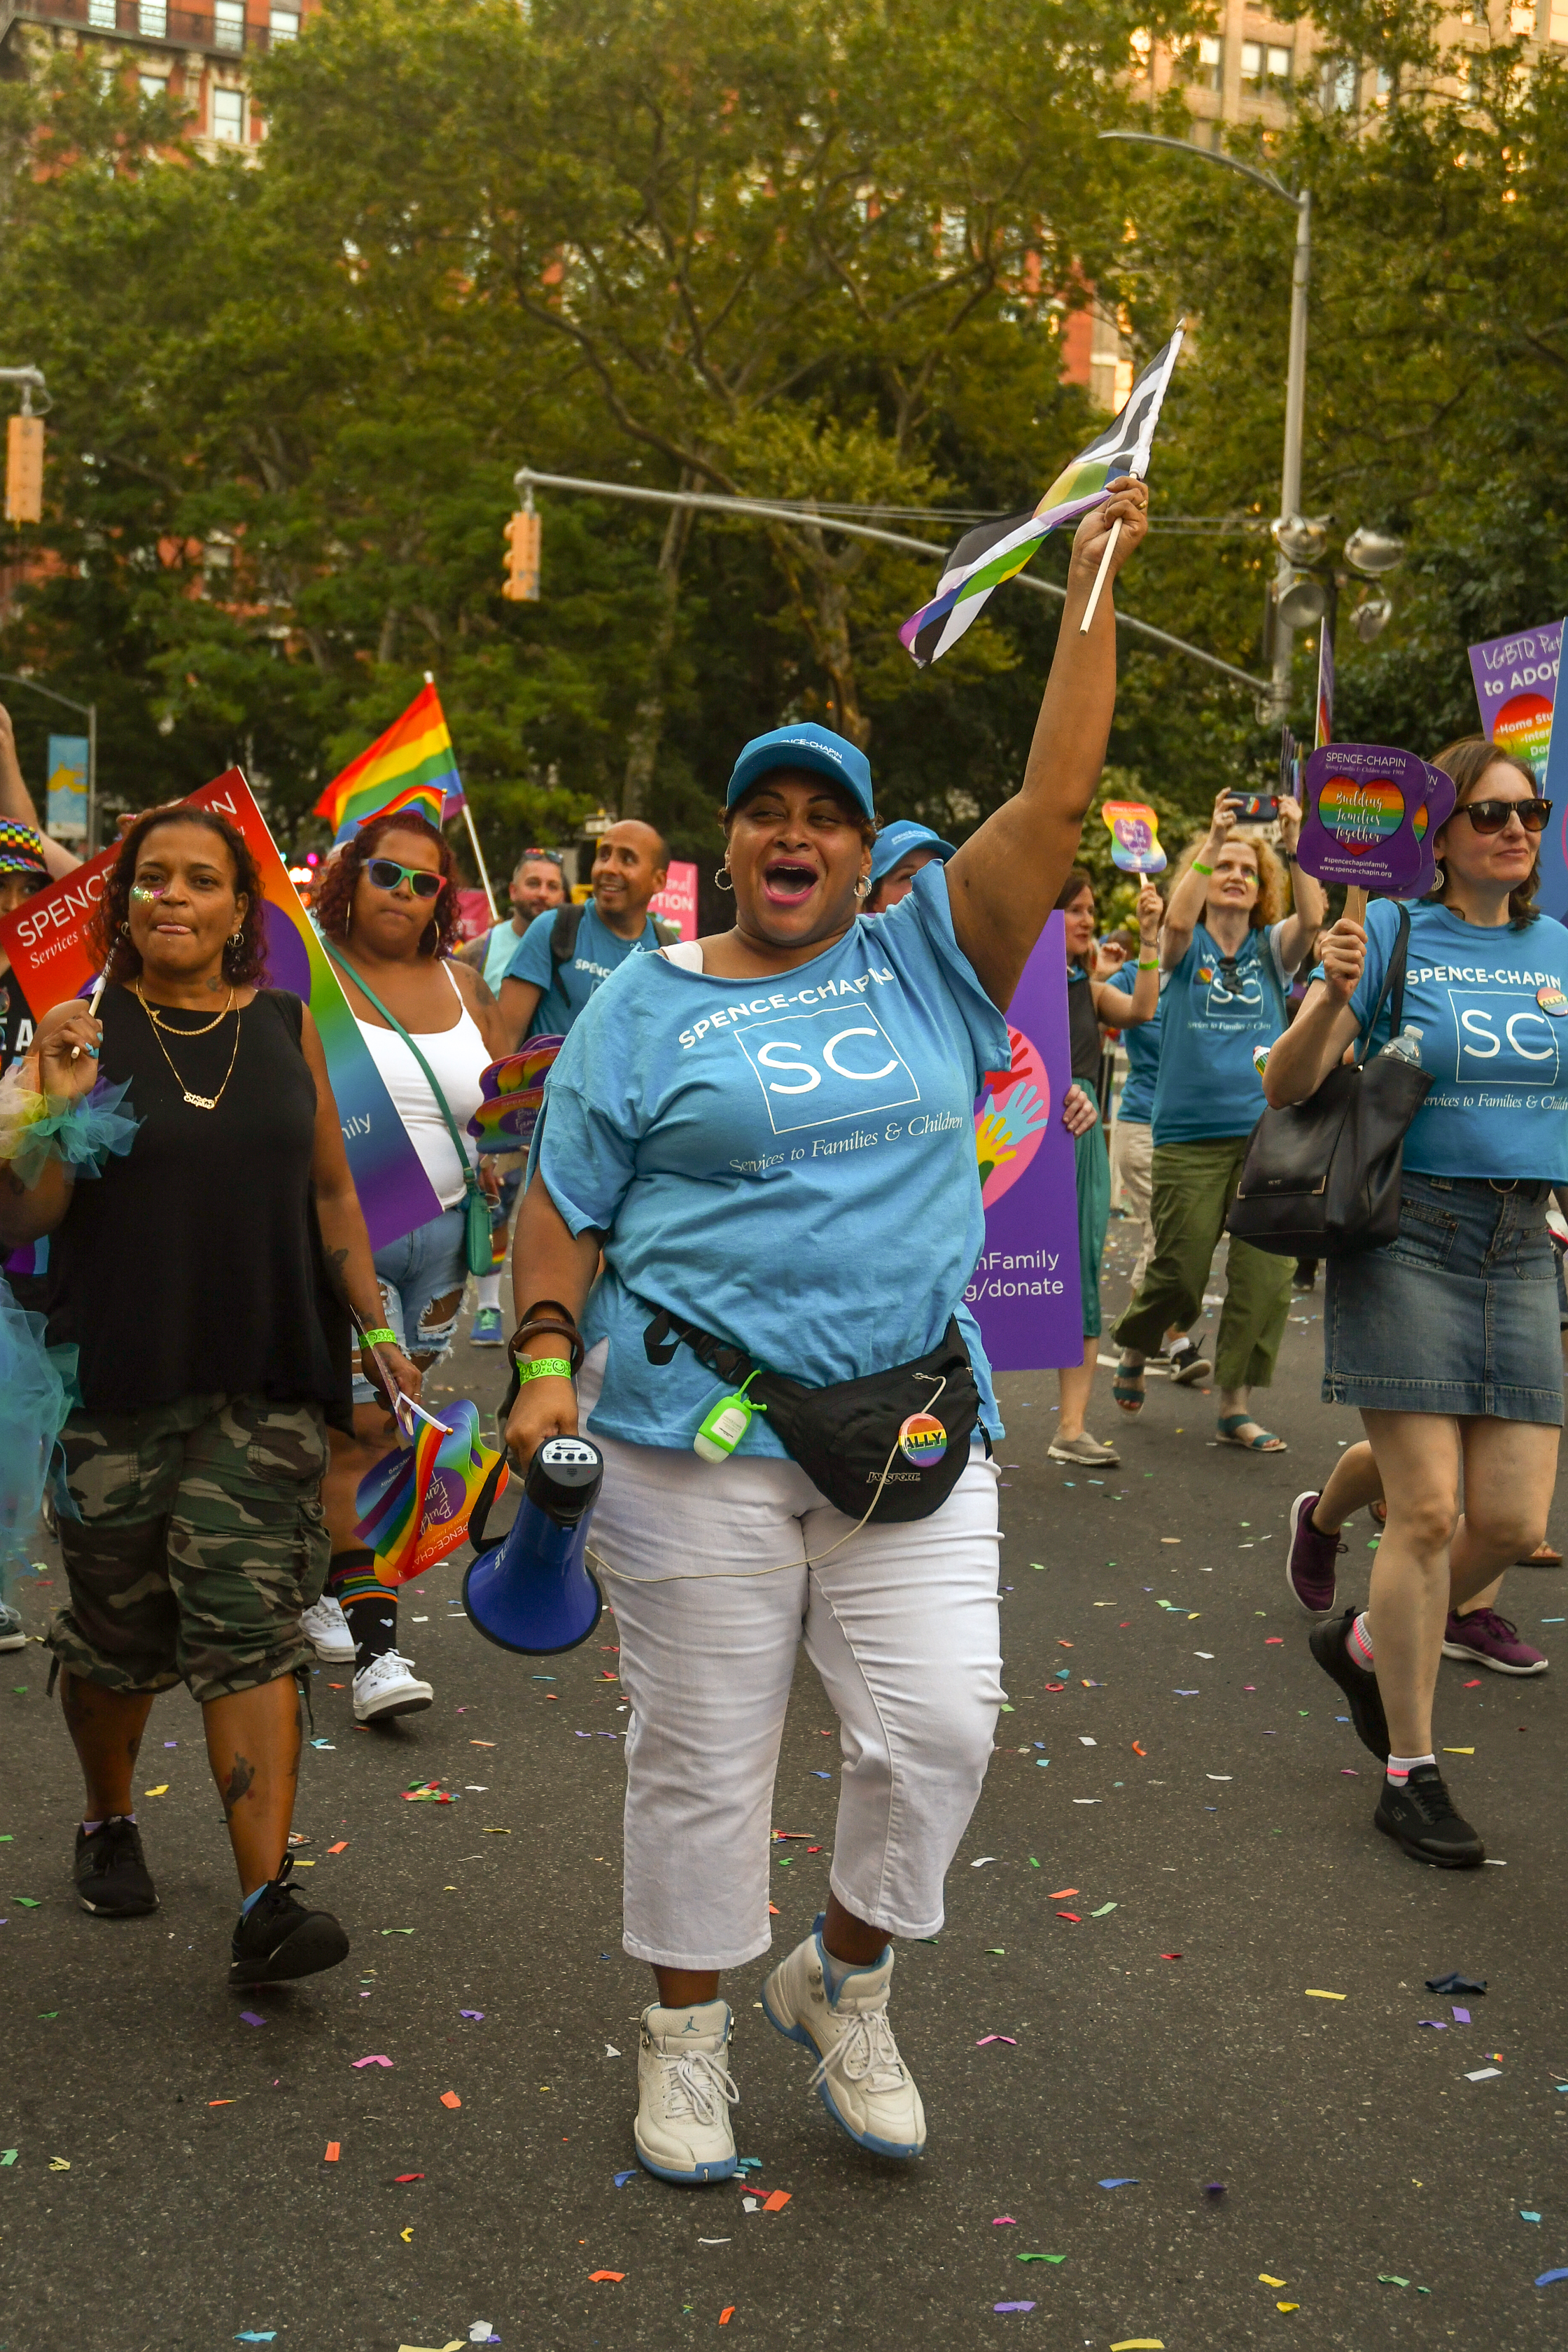 SC-PrideParade-2019_FE-168.jpg